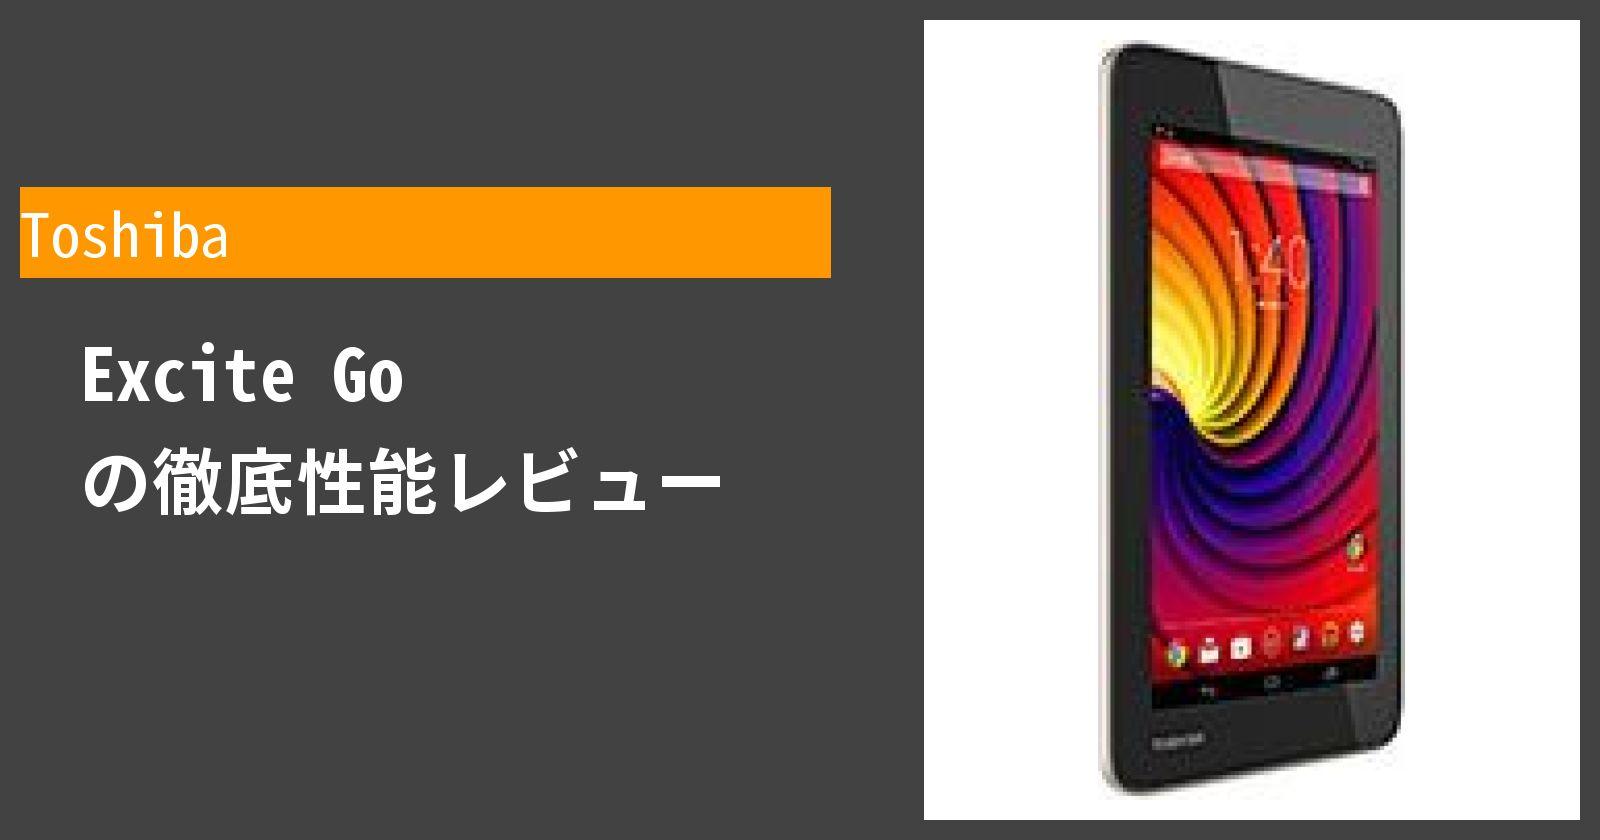 Toshiba Excite Go の徹底性能レビュー